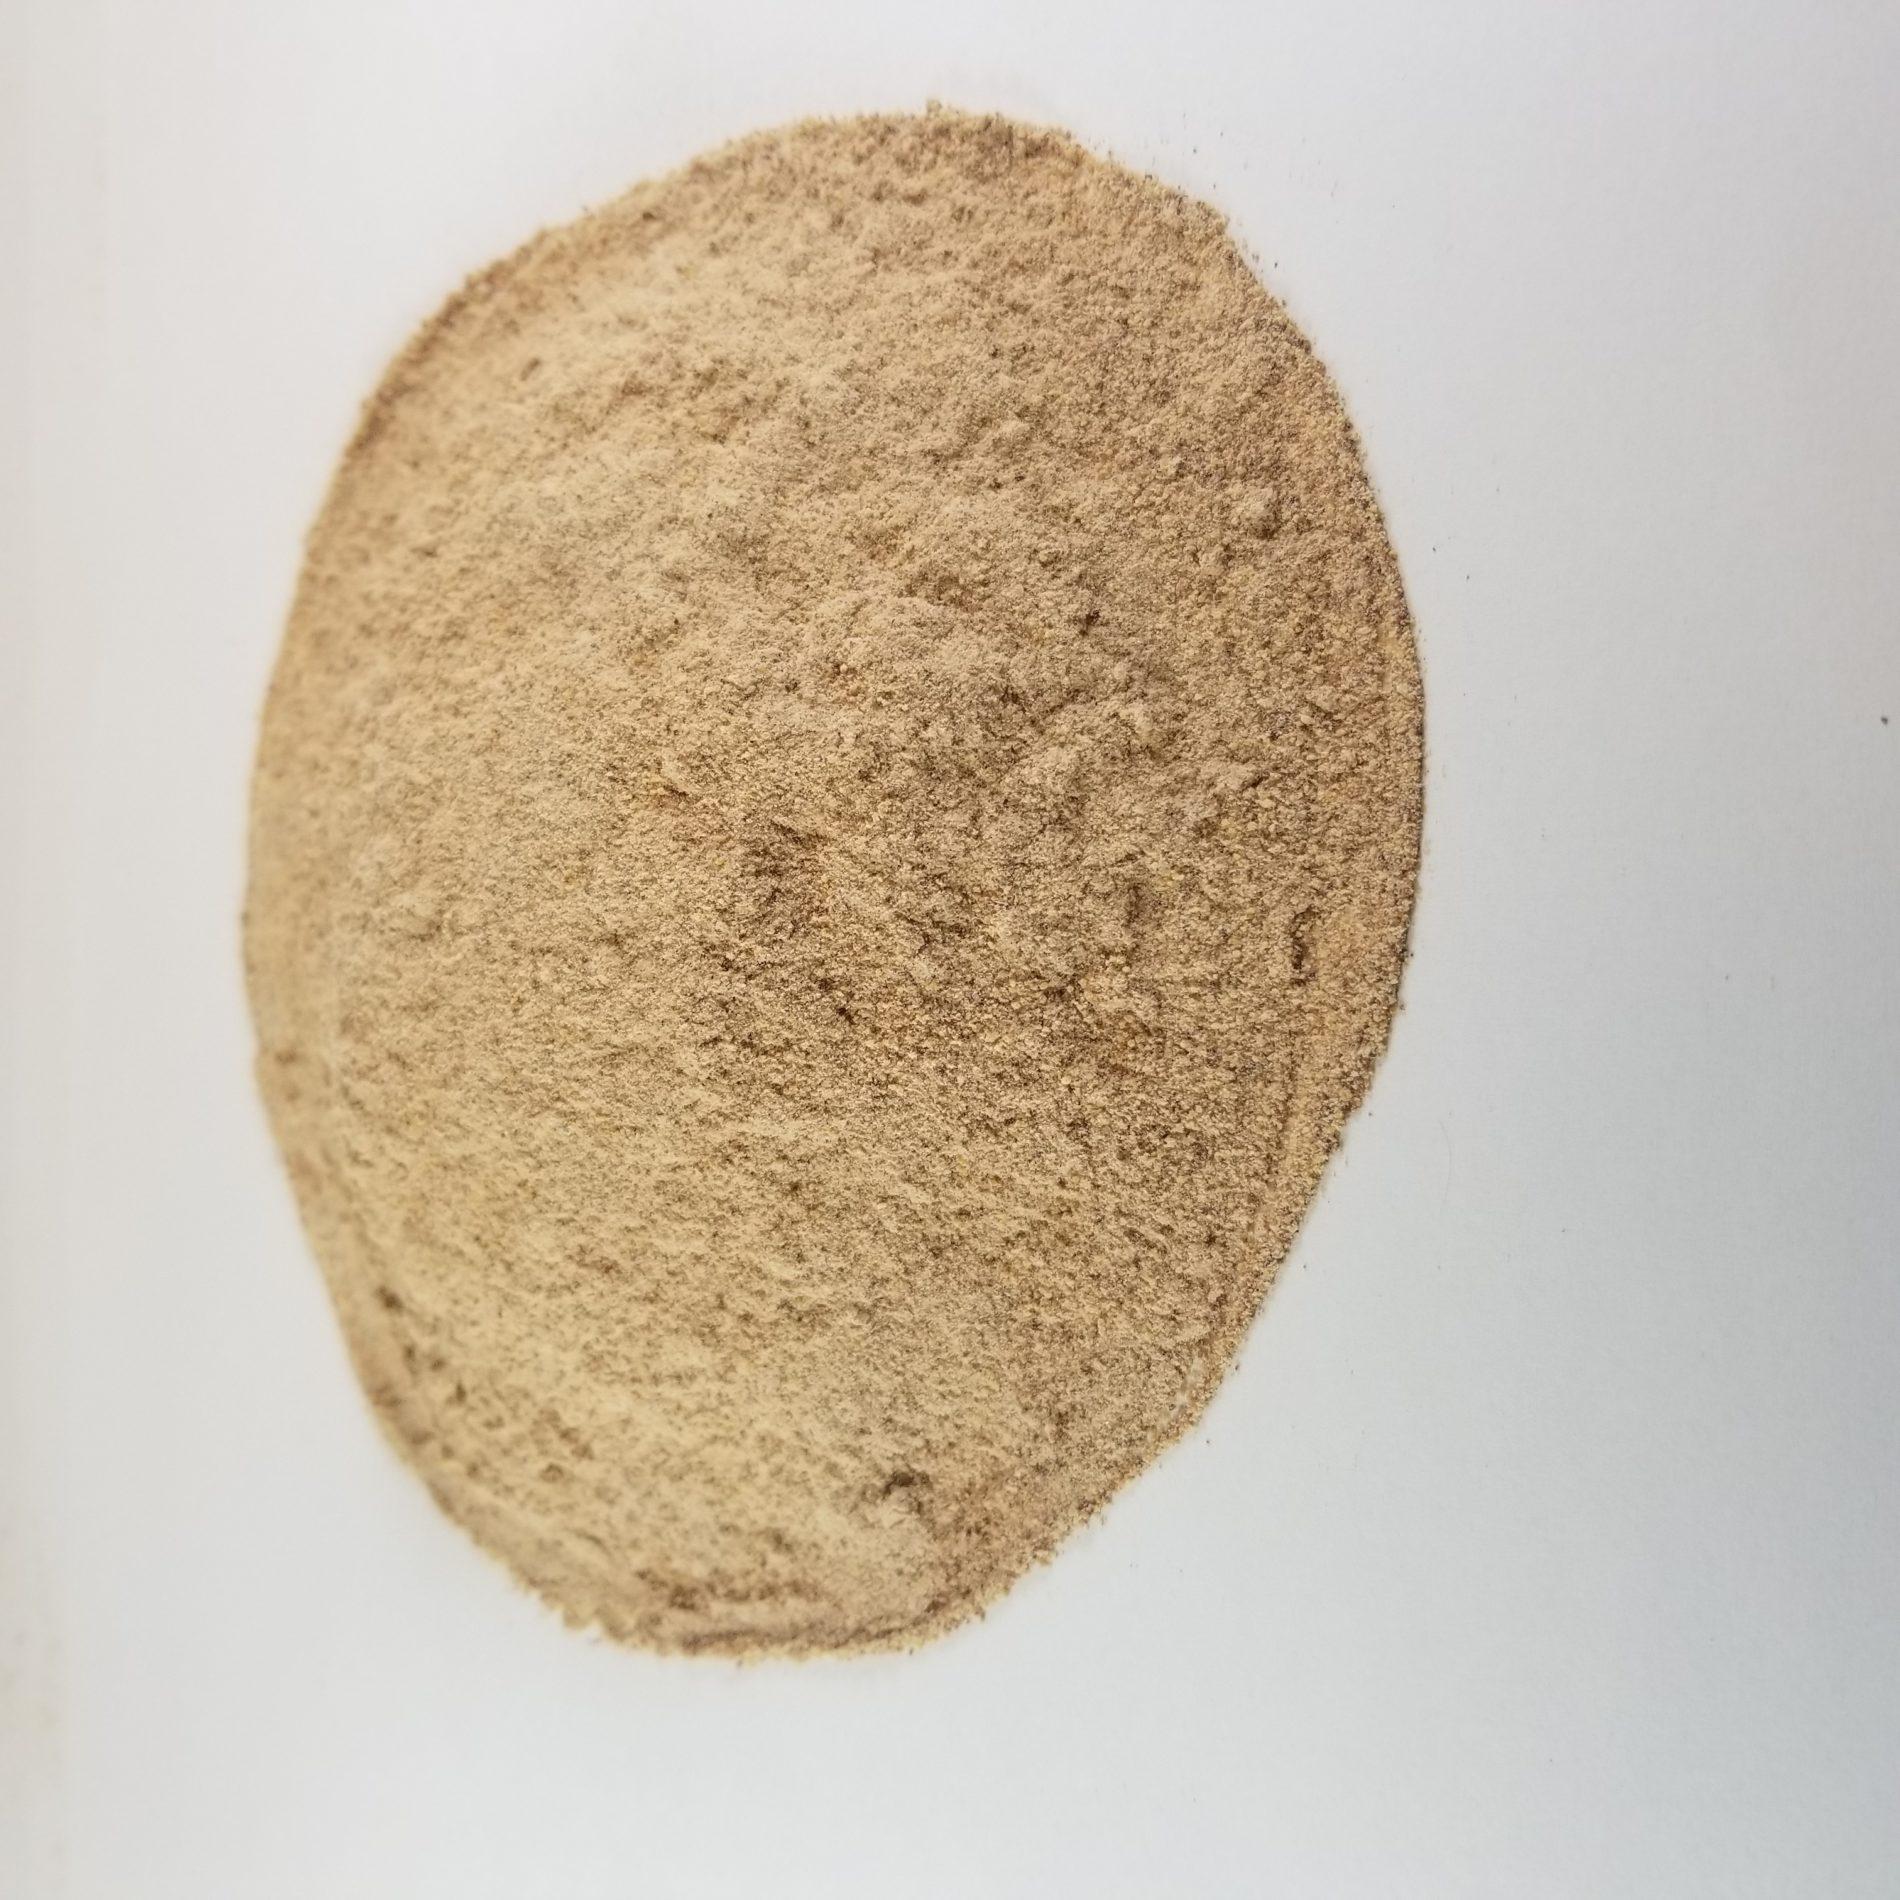 Red Bean Powder, 50LB Bag